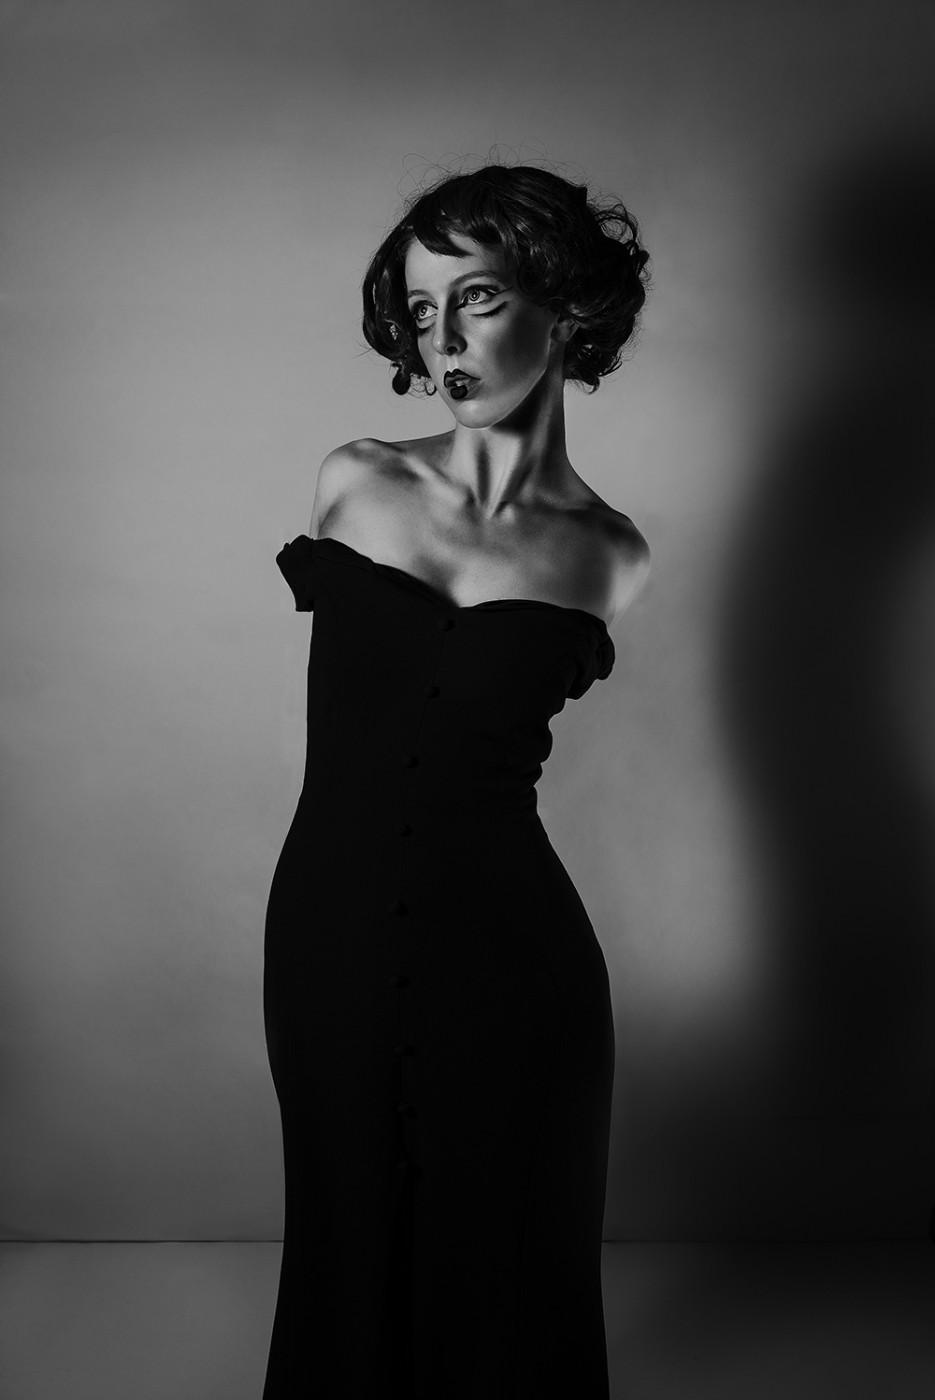 MICHEILA PETERSFIELD Black Dress 2016 Archival digital print 120 x 80 cm (unframed) Signed verso - Ed. of 5